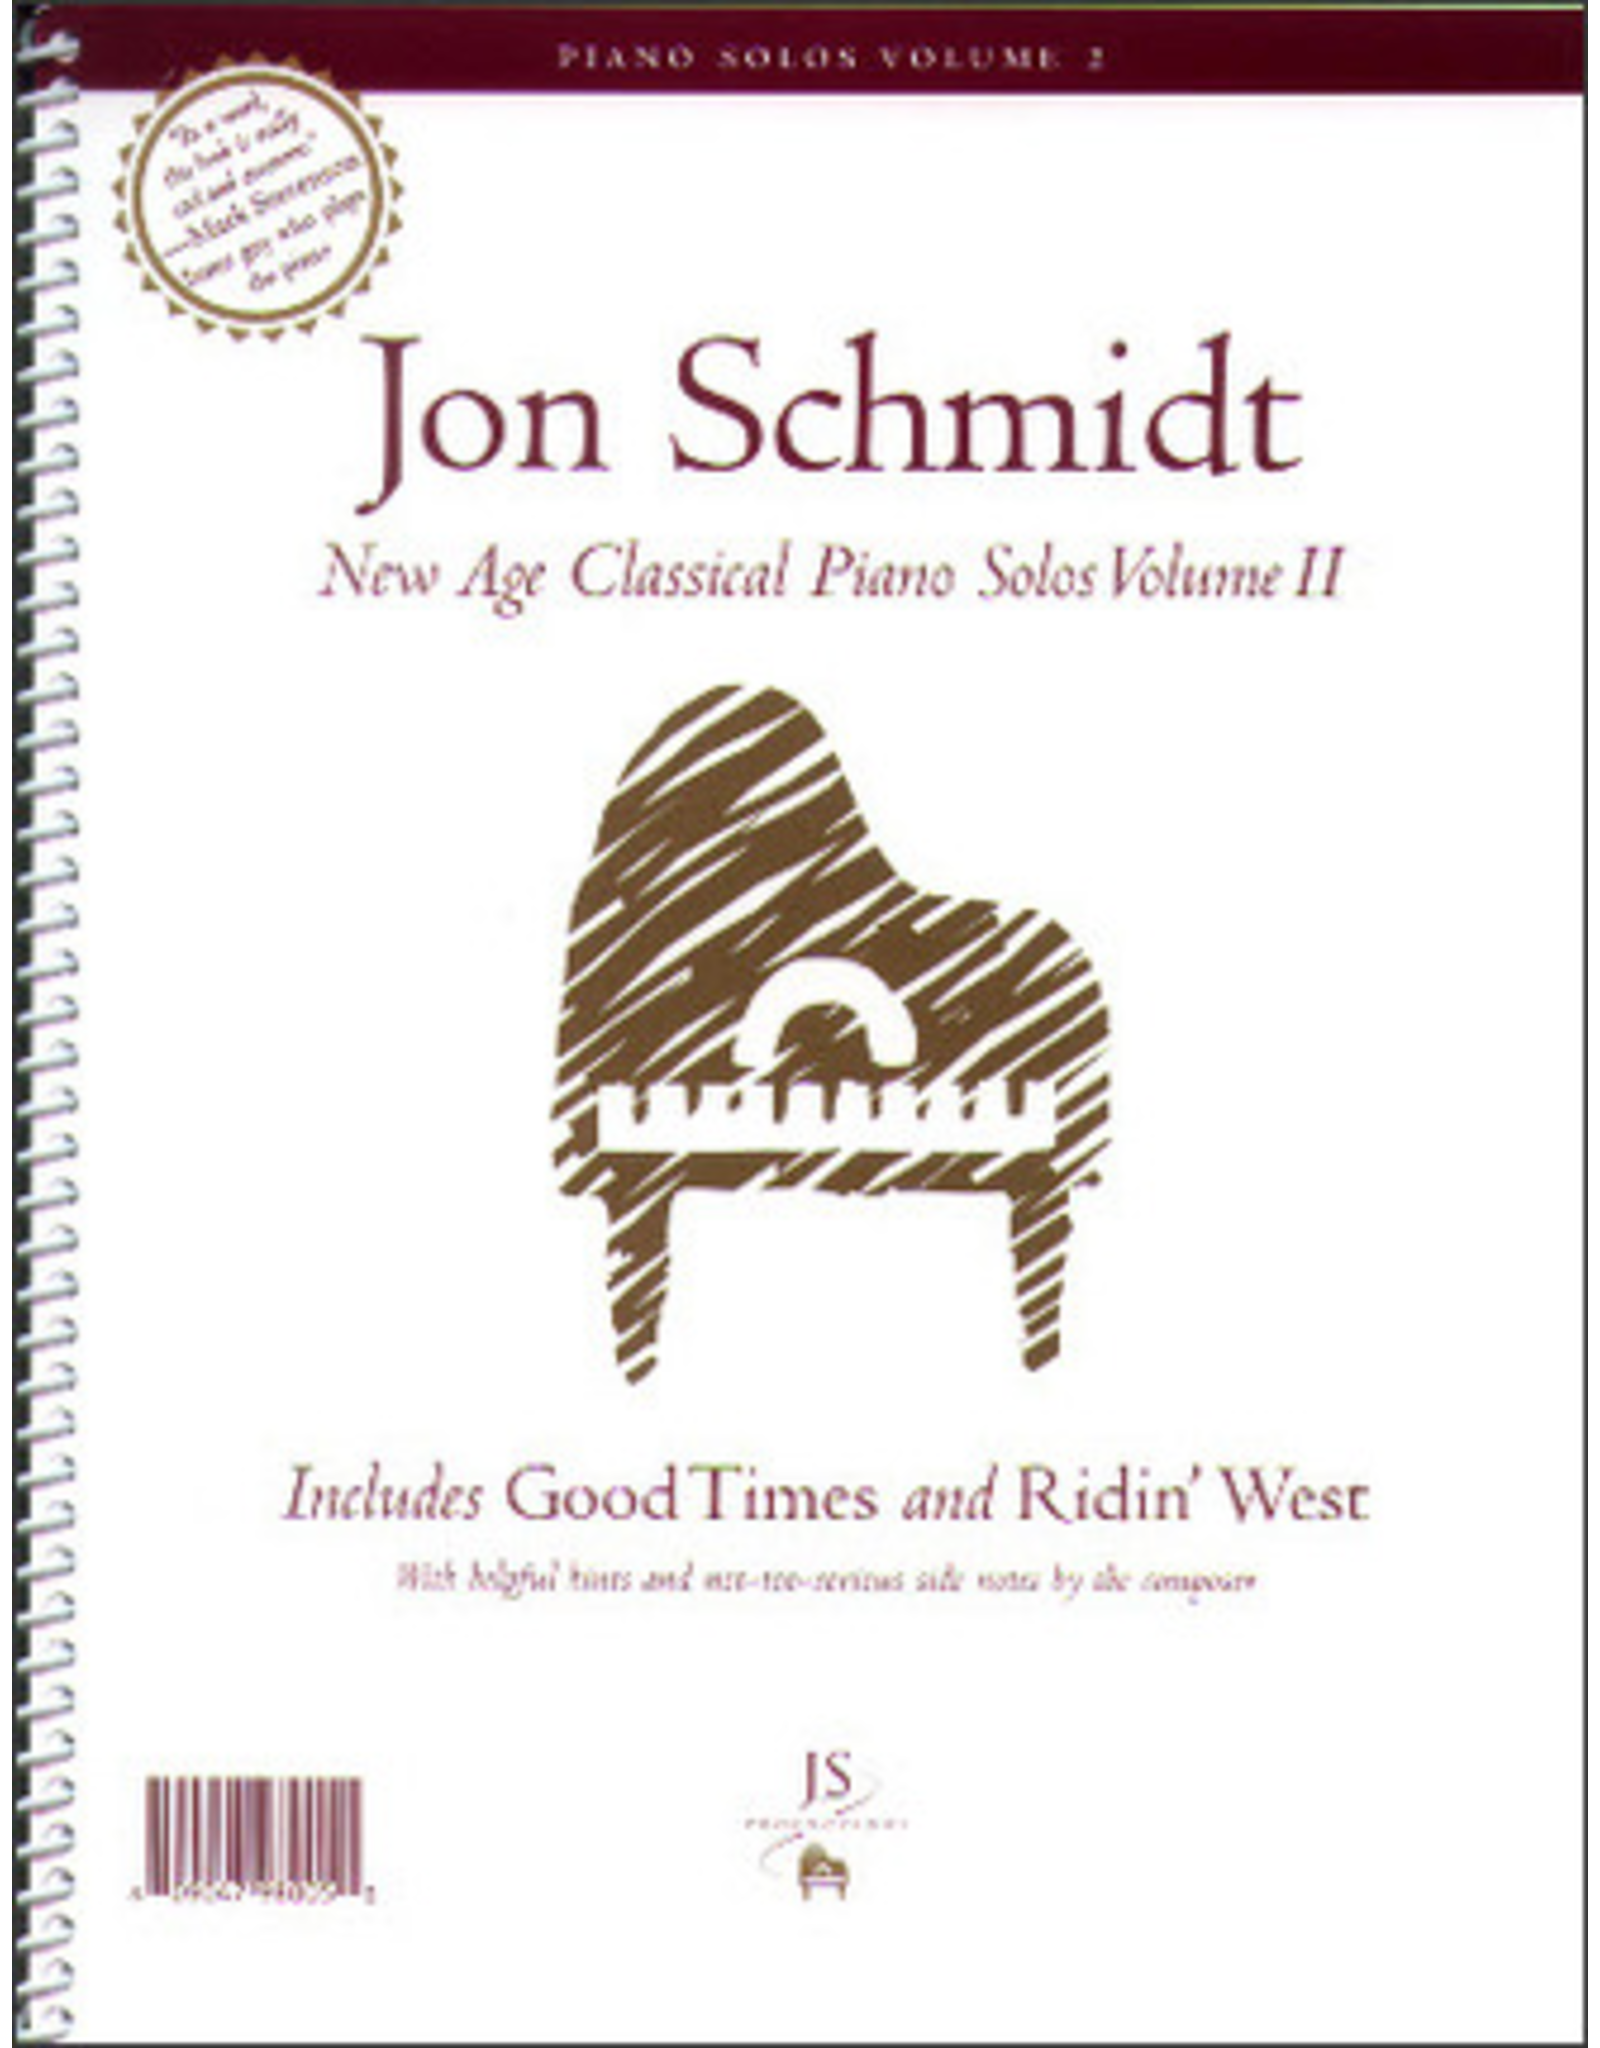 Jon Schmidt Music Jon Schmidt - New Age Classical Piano Solos Volume 2